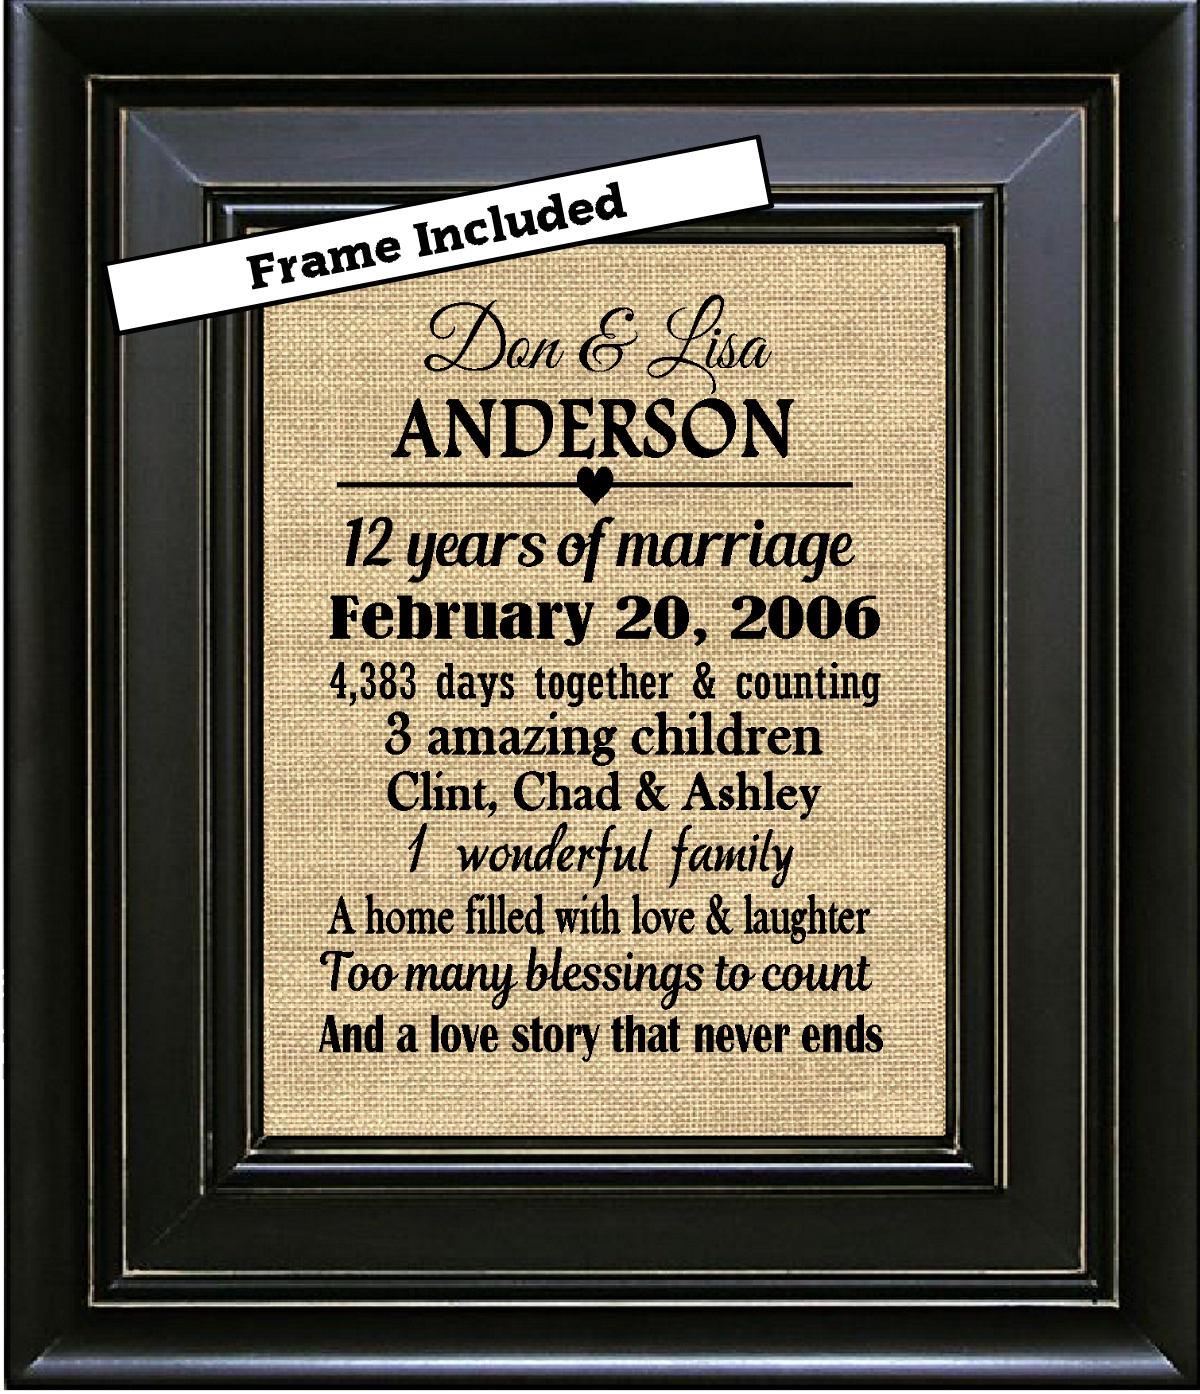 Gift For 12 Year Wedding Anniversary: FRAMED Personalized 12th Wedding Anniversary Gift/12th